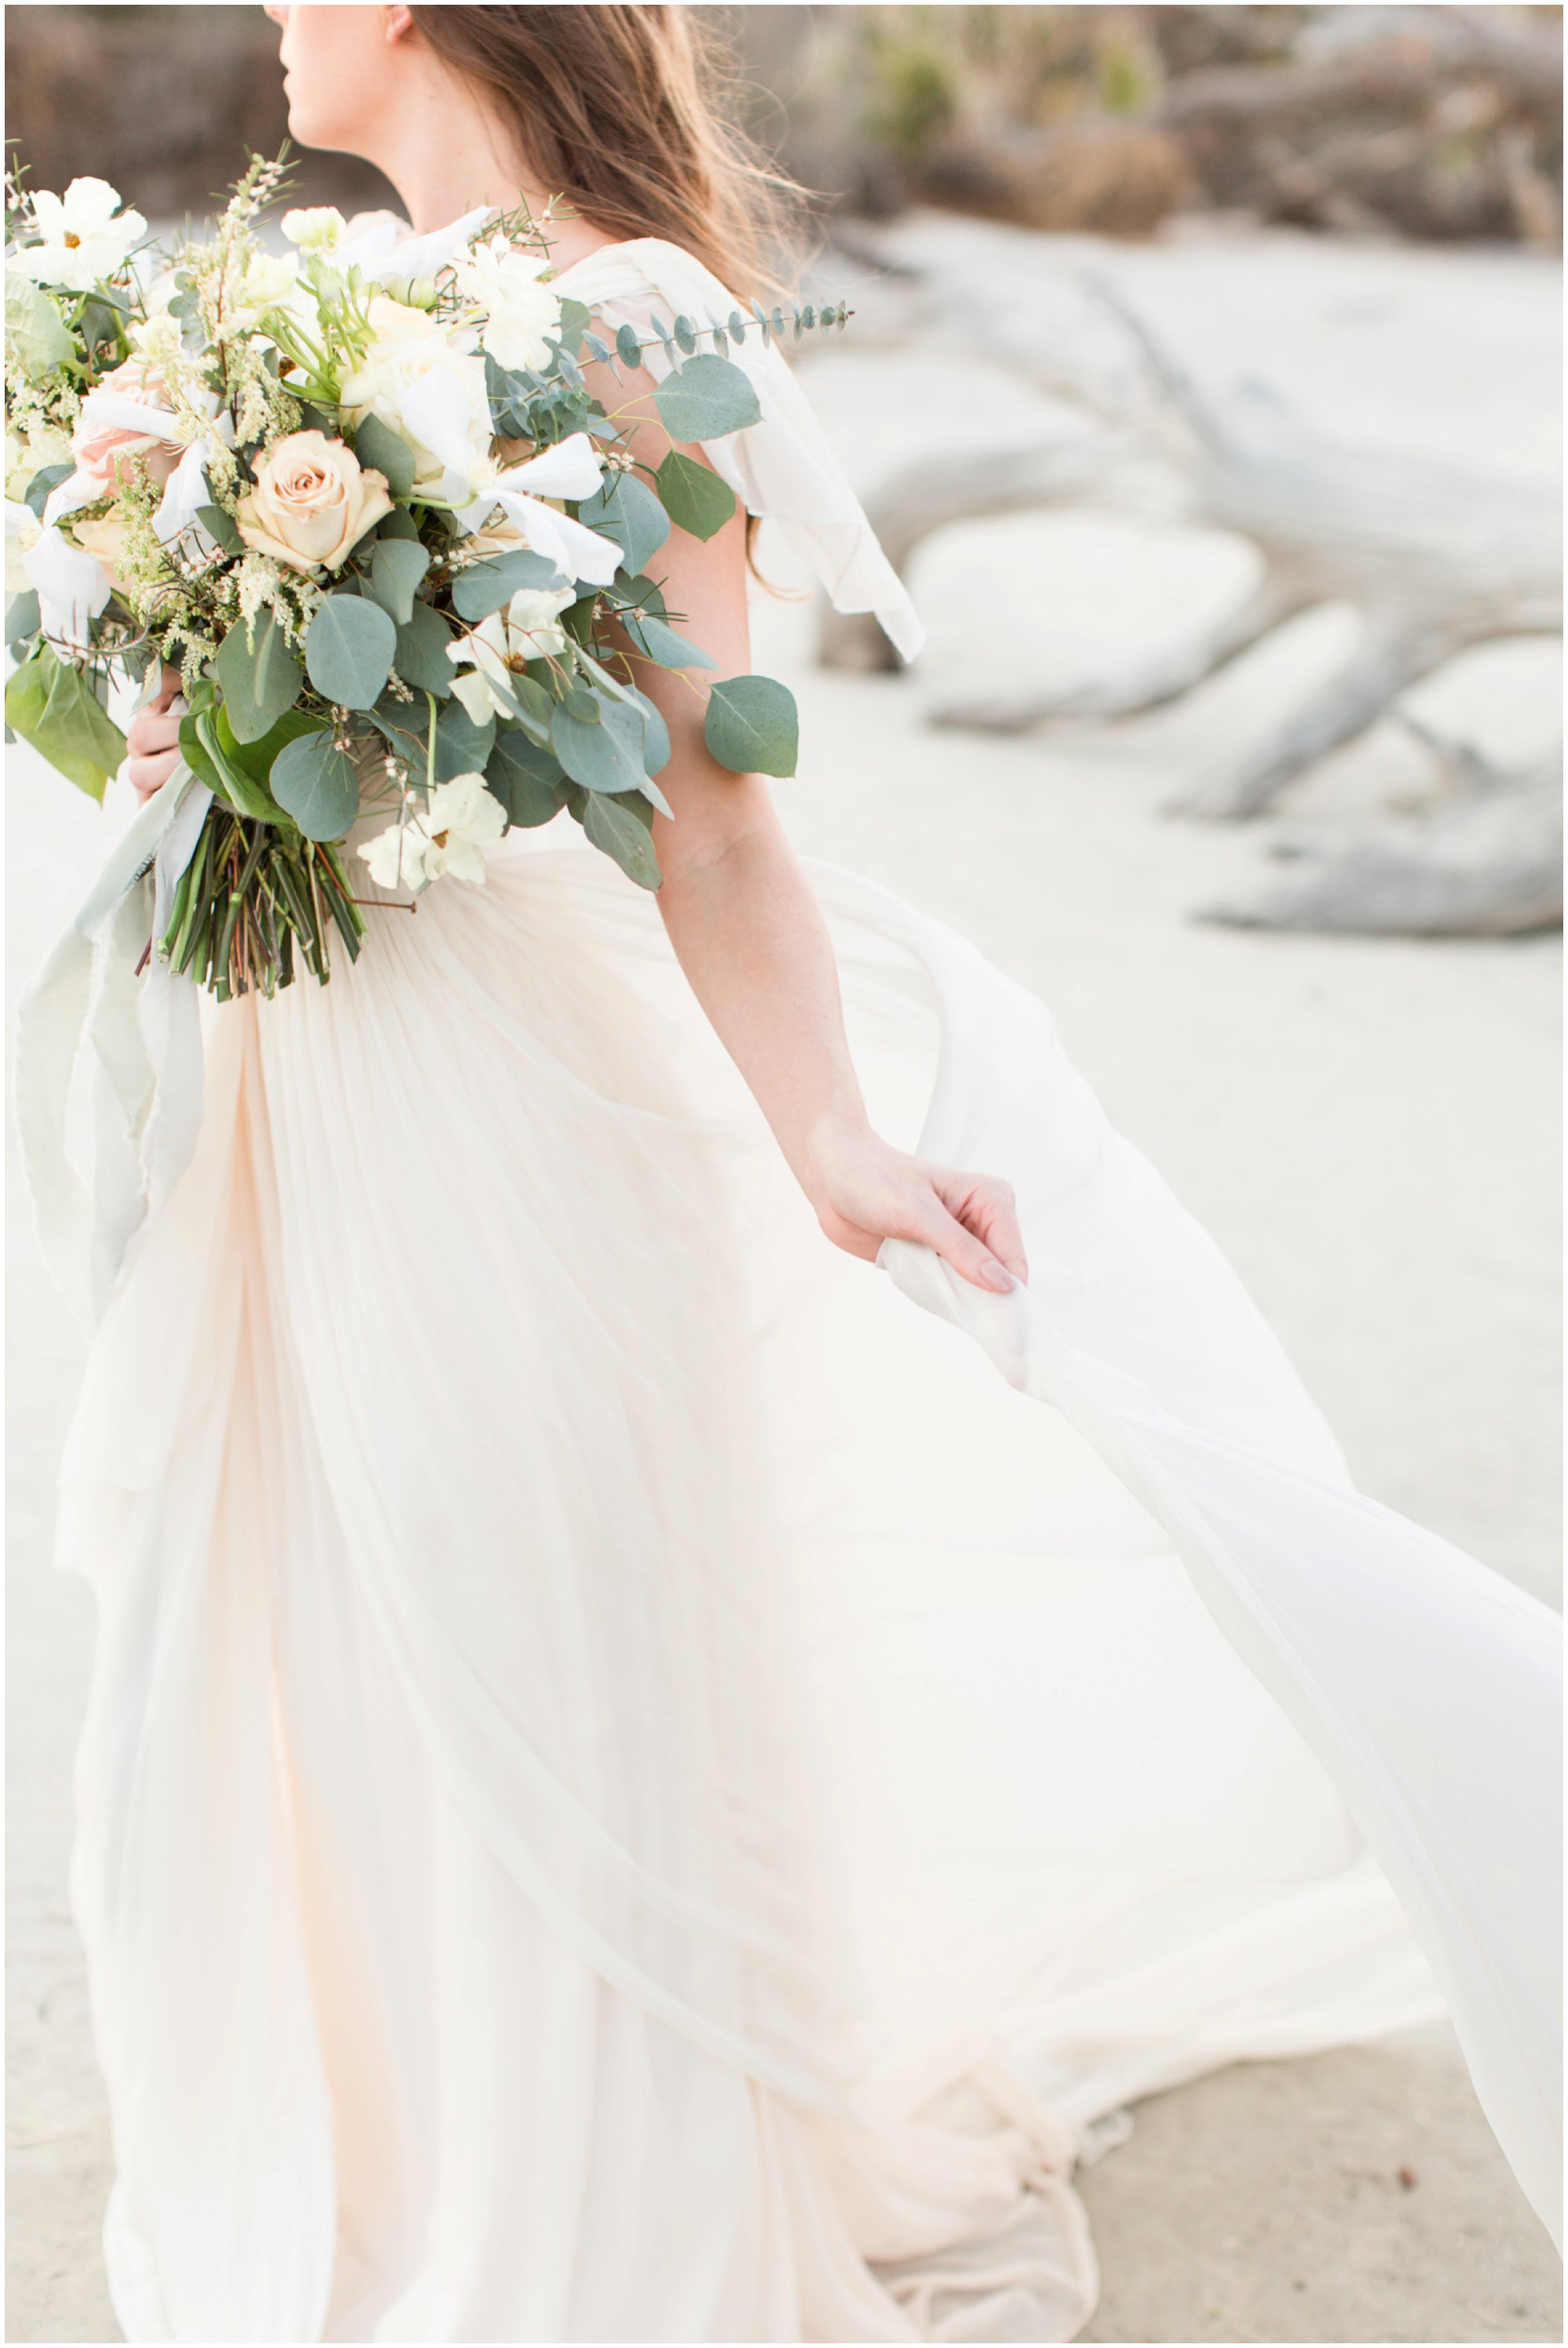 Destination-wedding-photographer137sg